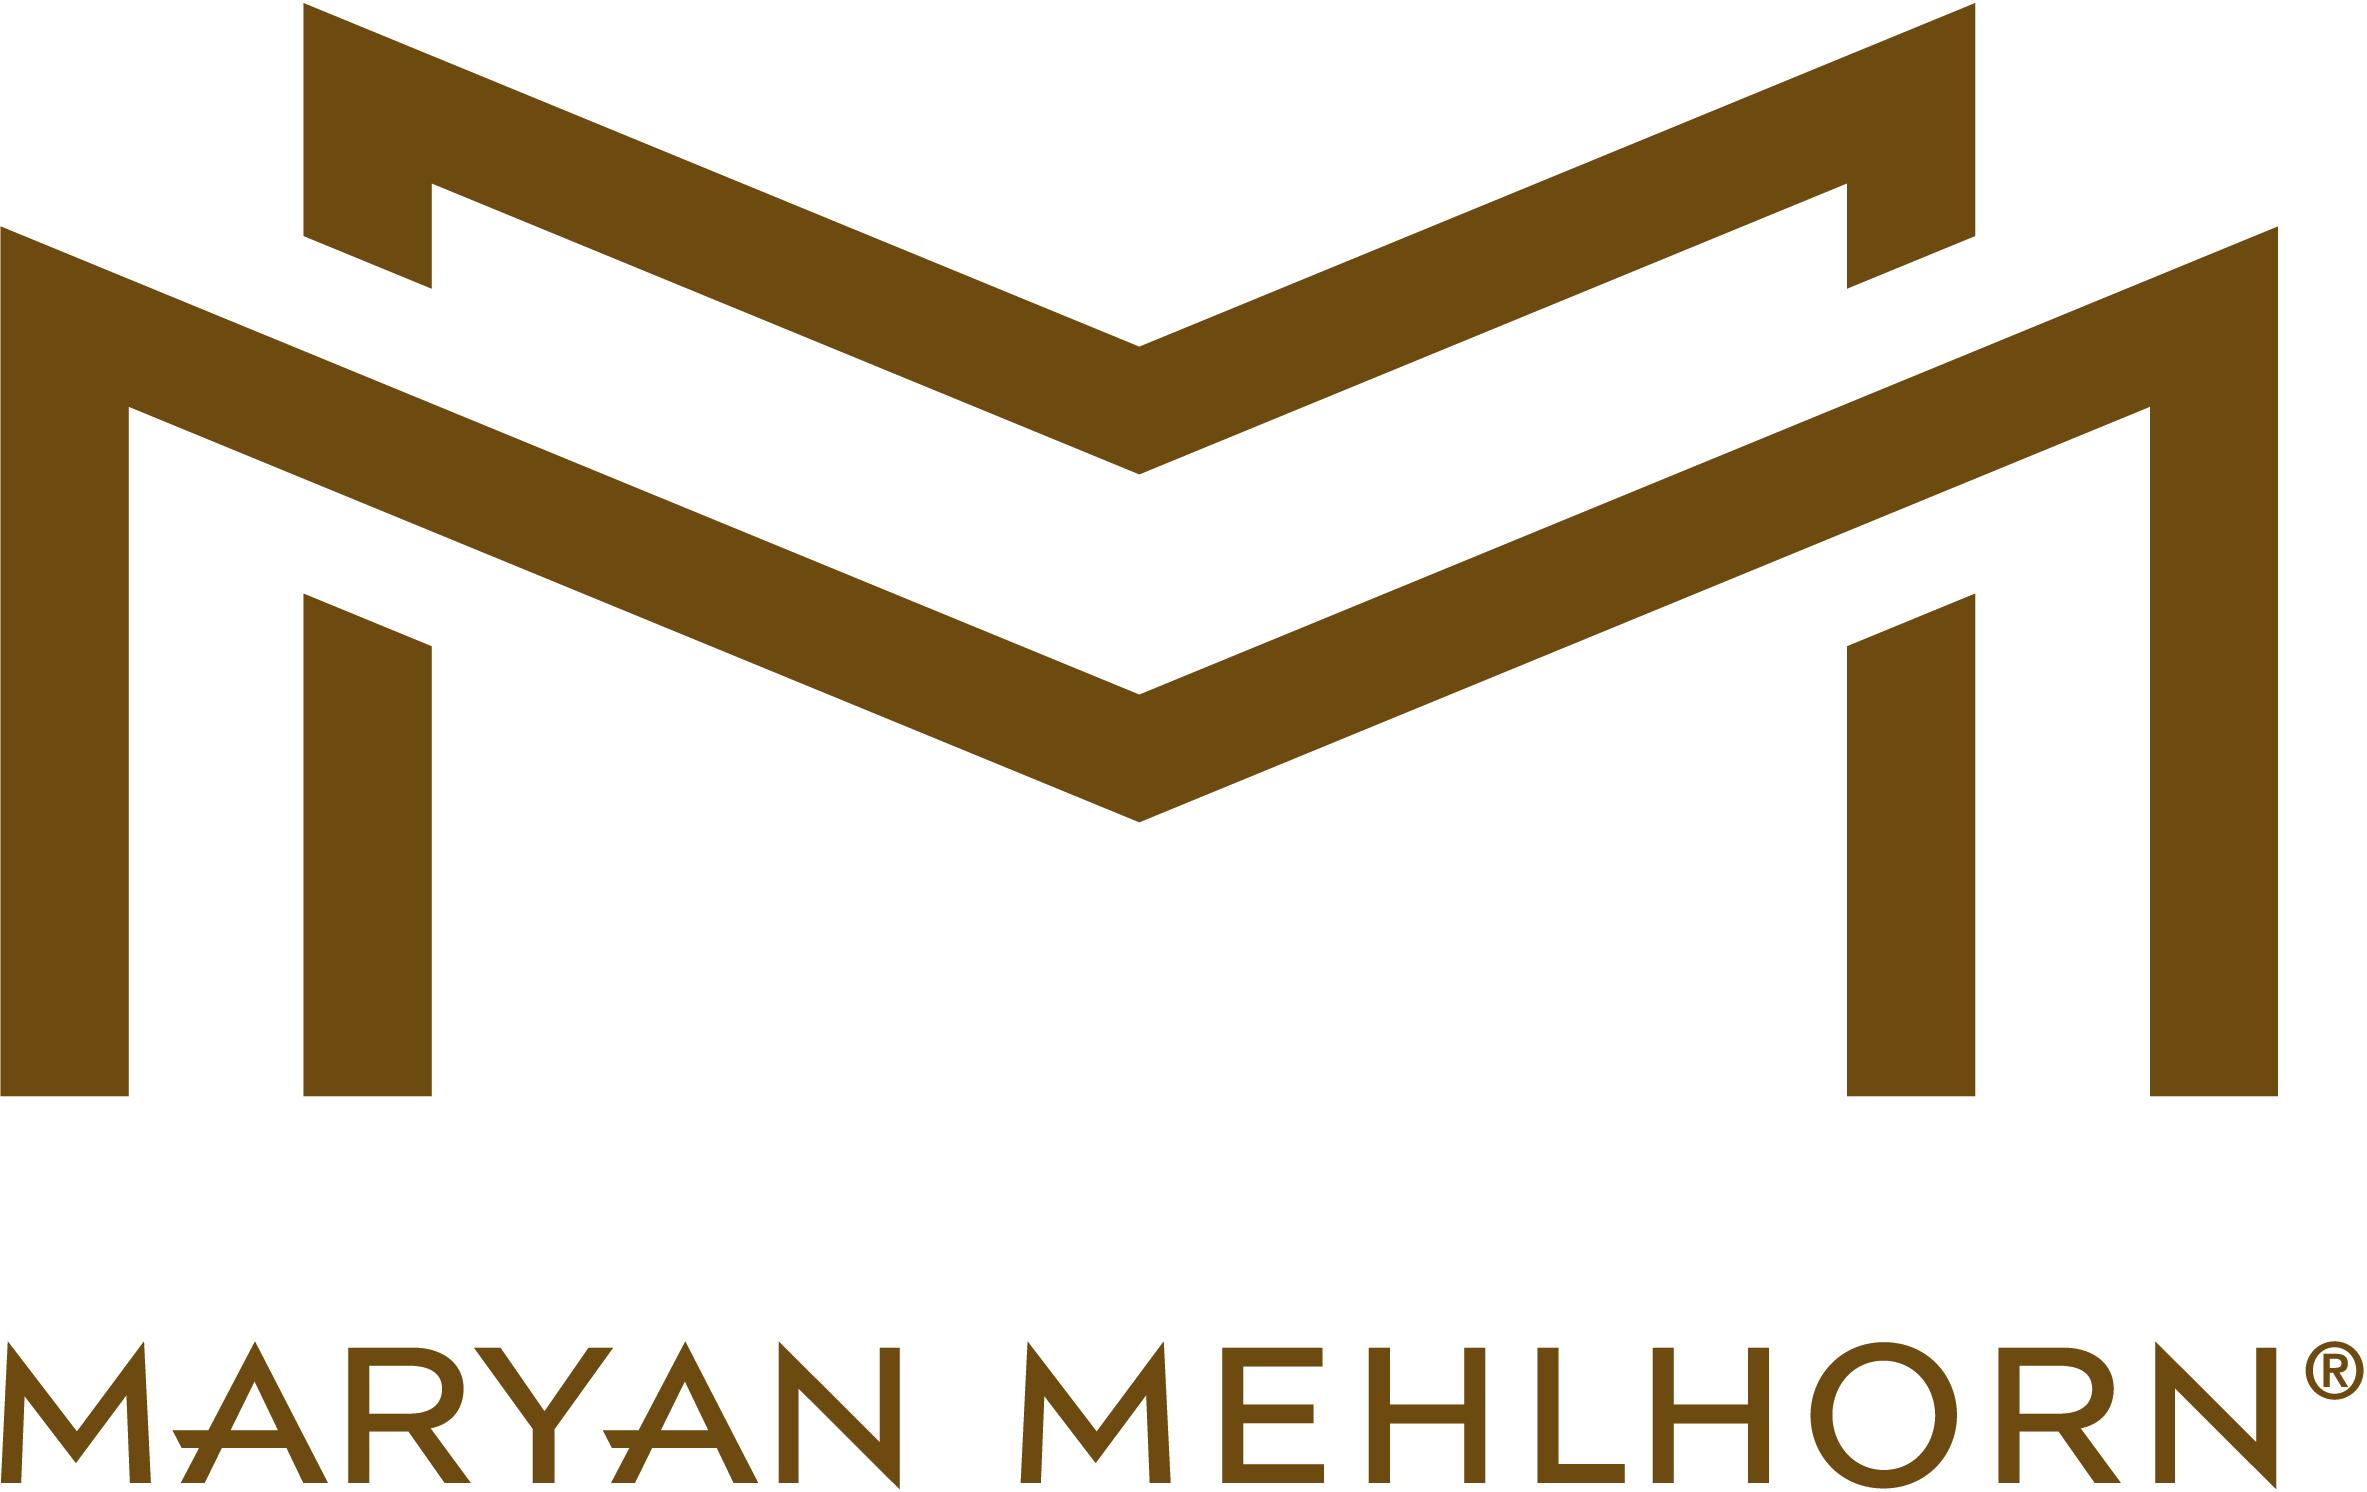 _maryan-mehlhorn-wAssets_haendlerbereich_logos_MM-WB-Pantone-8583.jpg